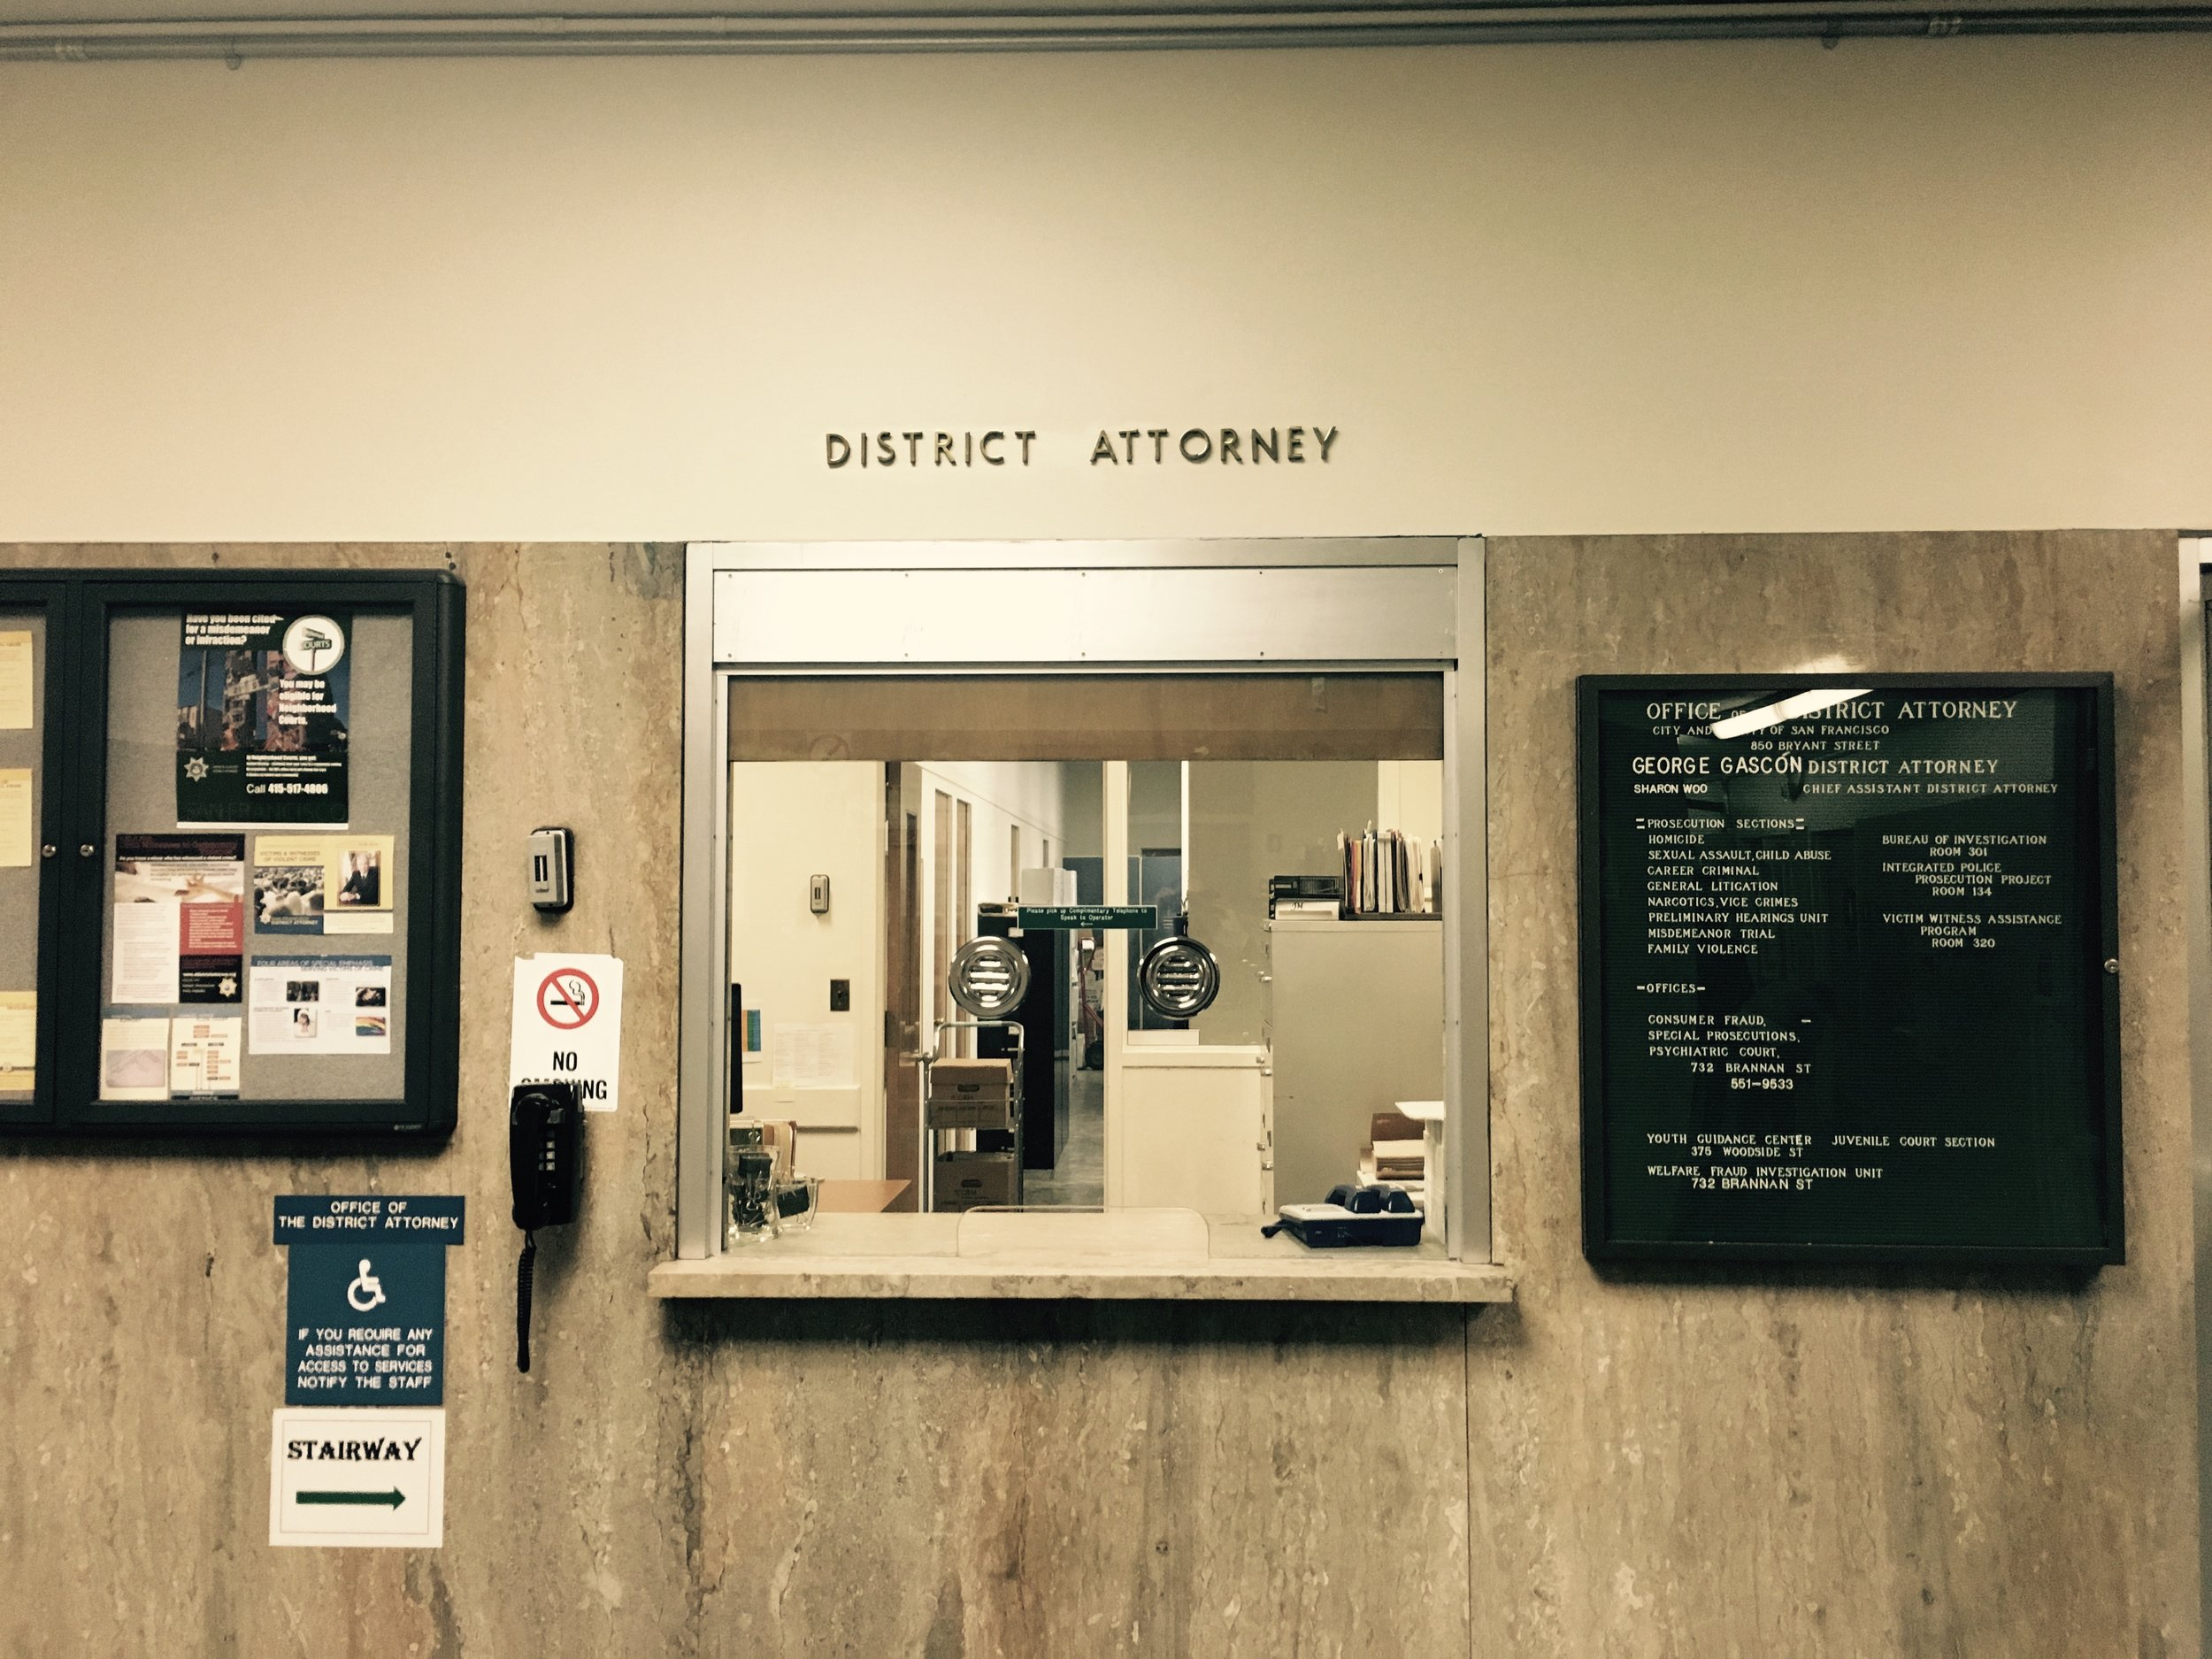 District Attorney George Gascon's office. San Francisco, CA.